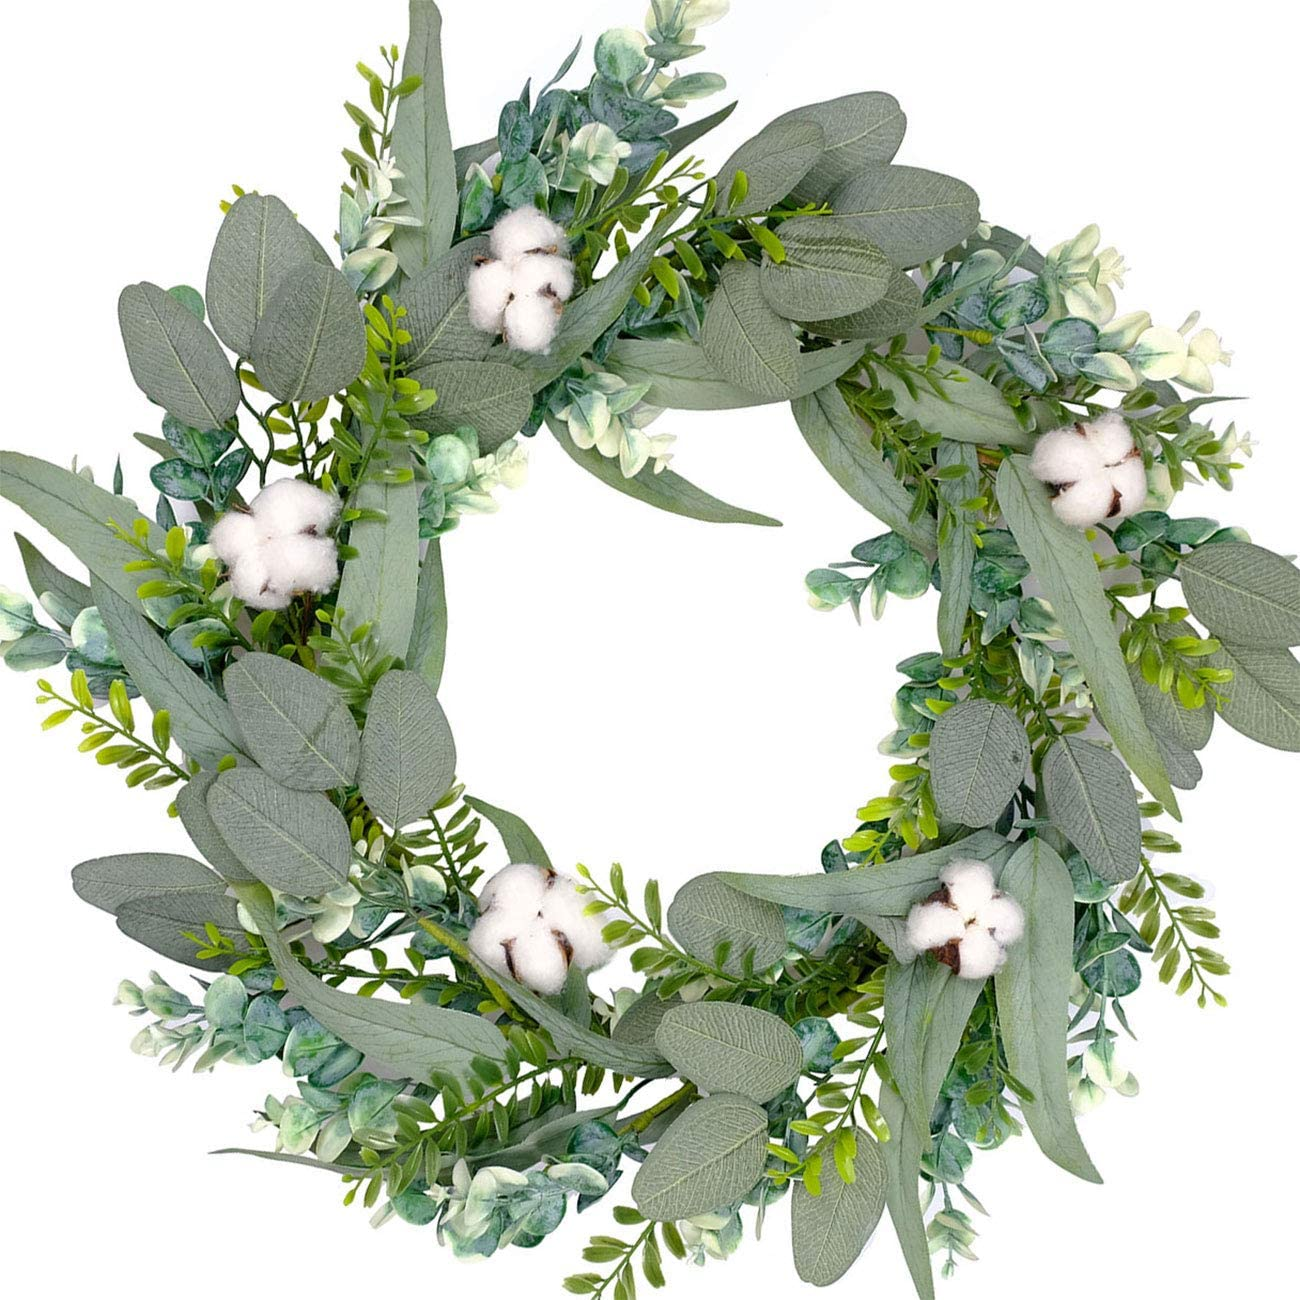 Bibelot 20 Inch Green Leaves Eucalyptus with Real Cotton Ball Wreath for Front Door,Farmhouse Decor,Indoor,Outdoor,Wedding,Home Decor